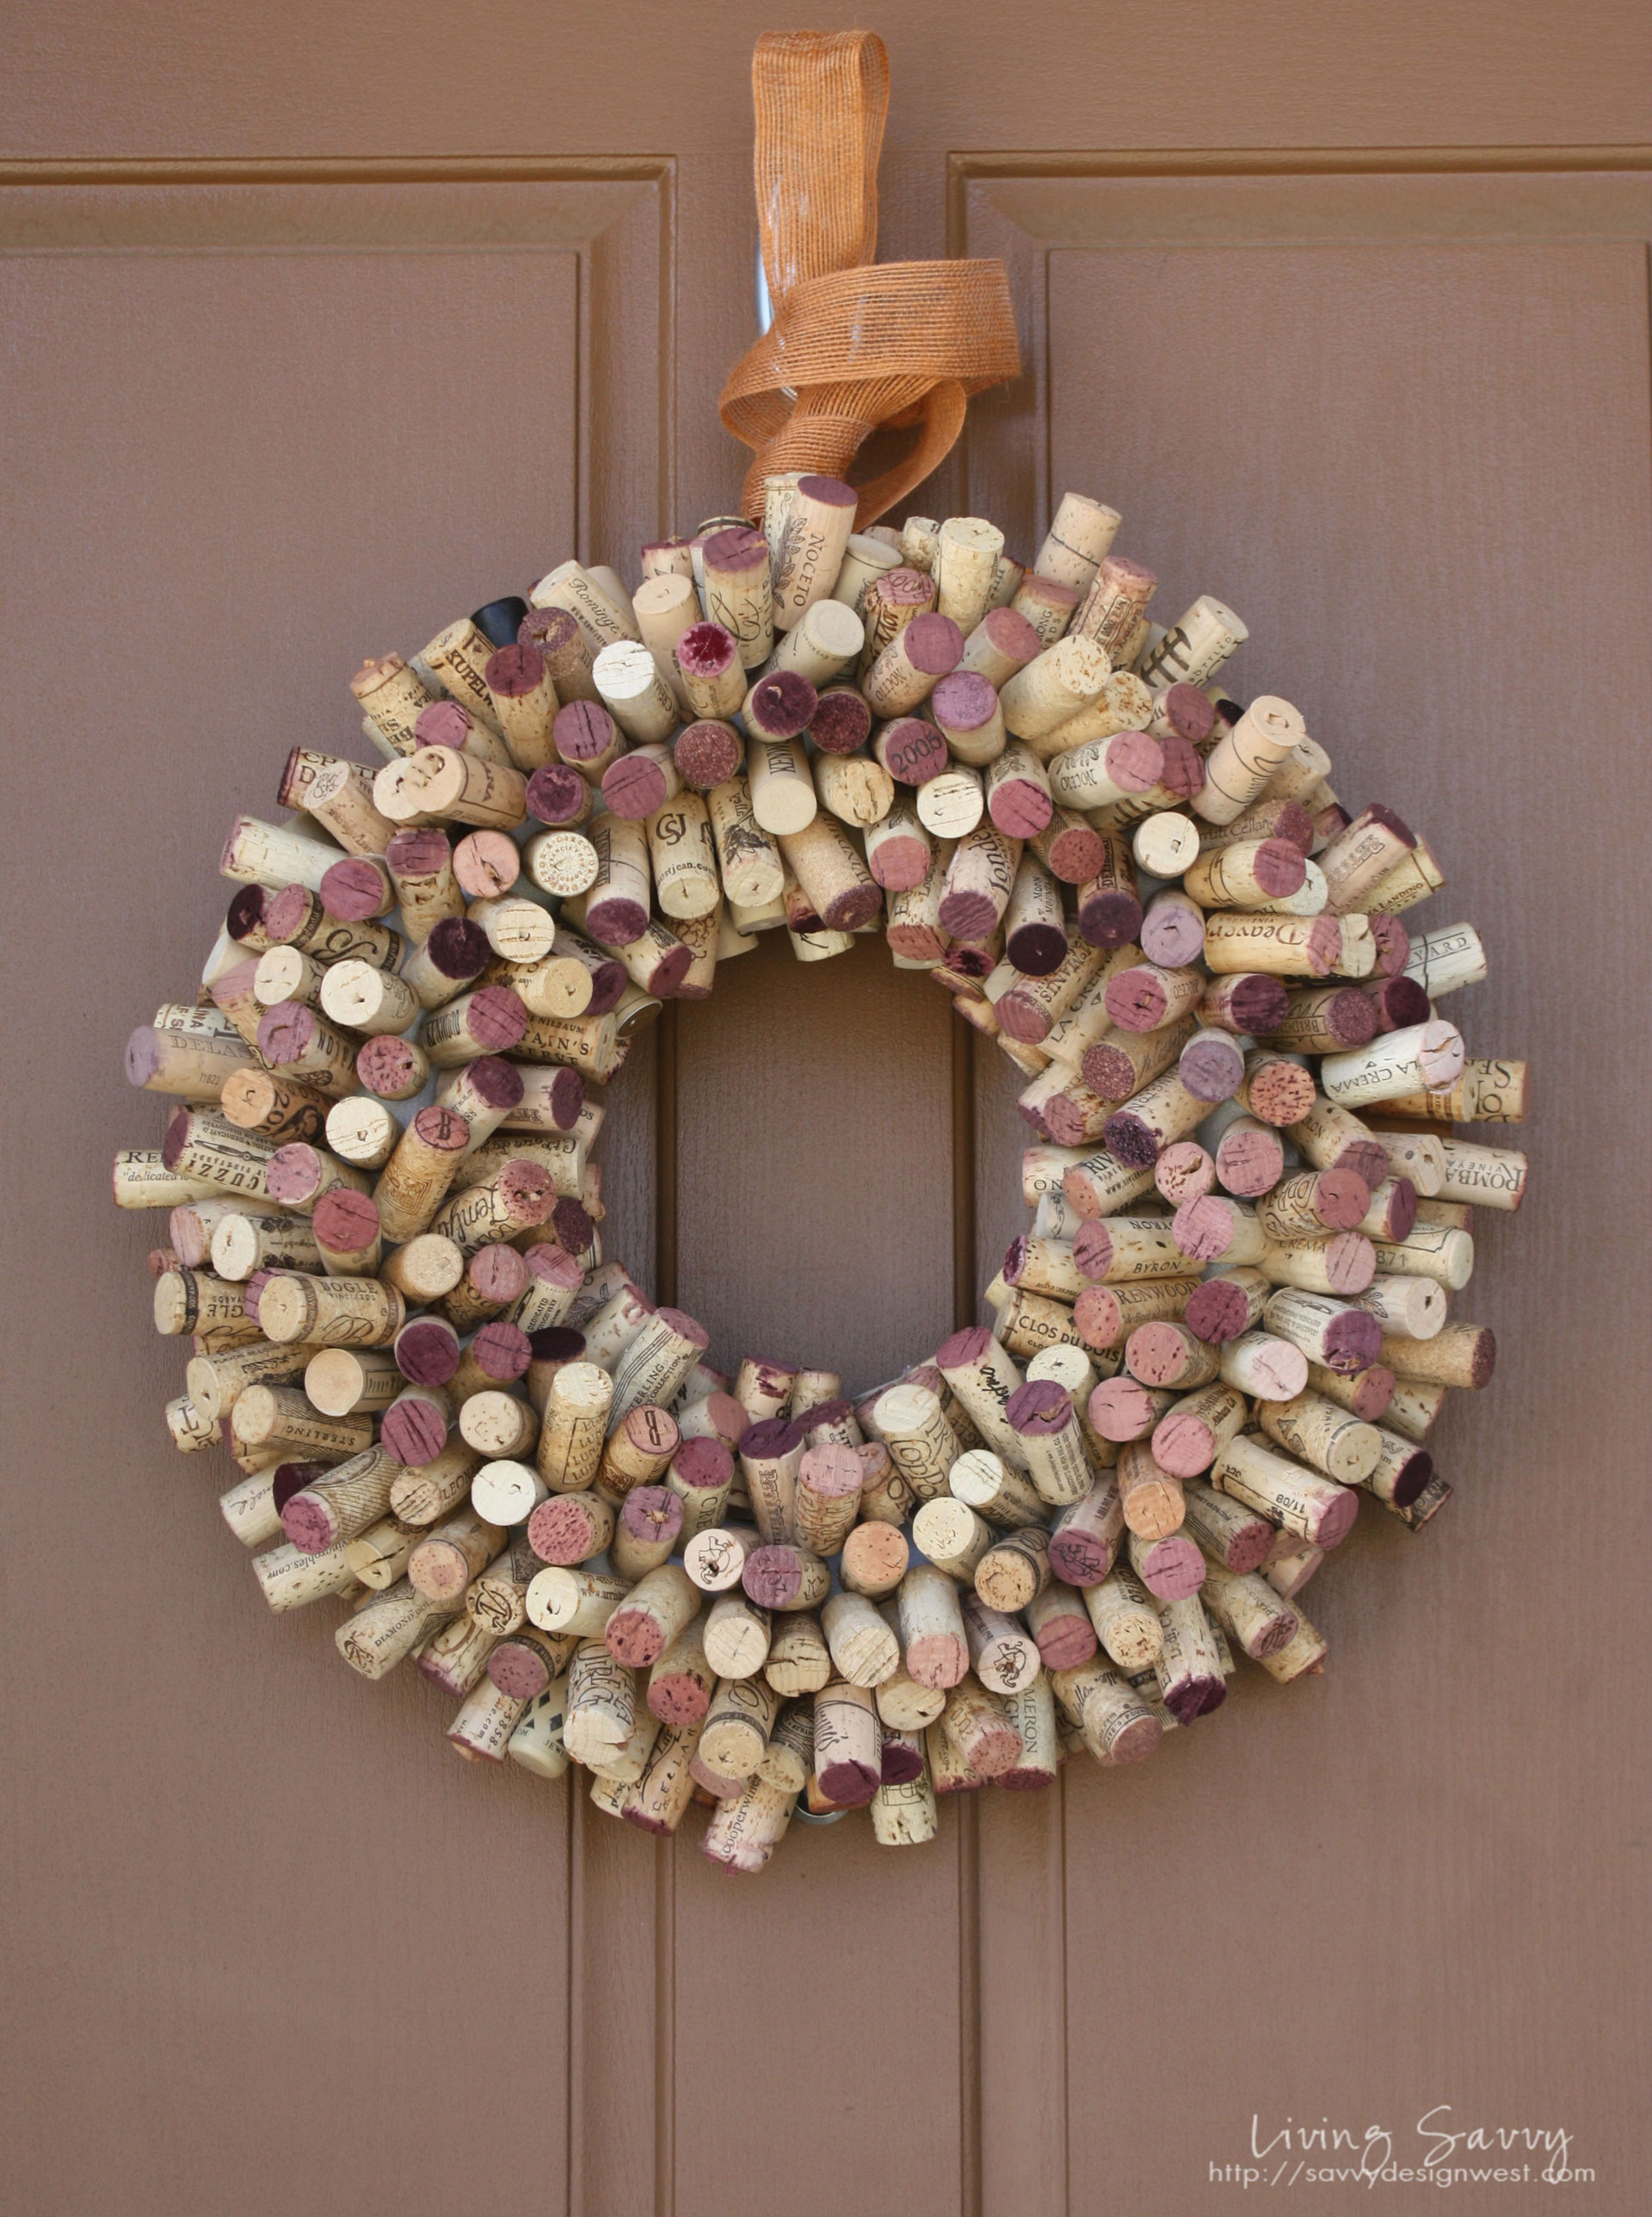 wine cork crafts - diy projects for leftover wine corks